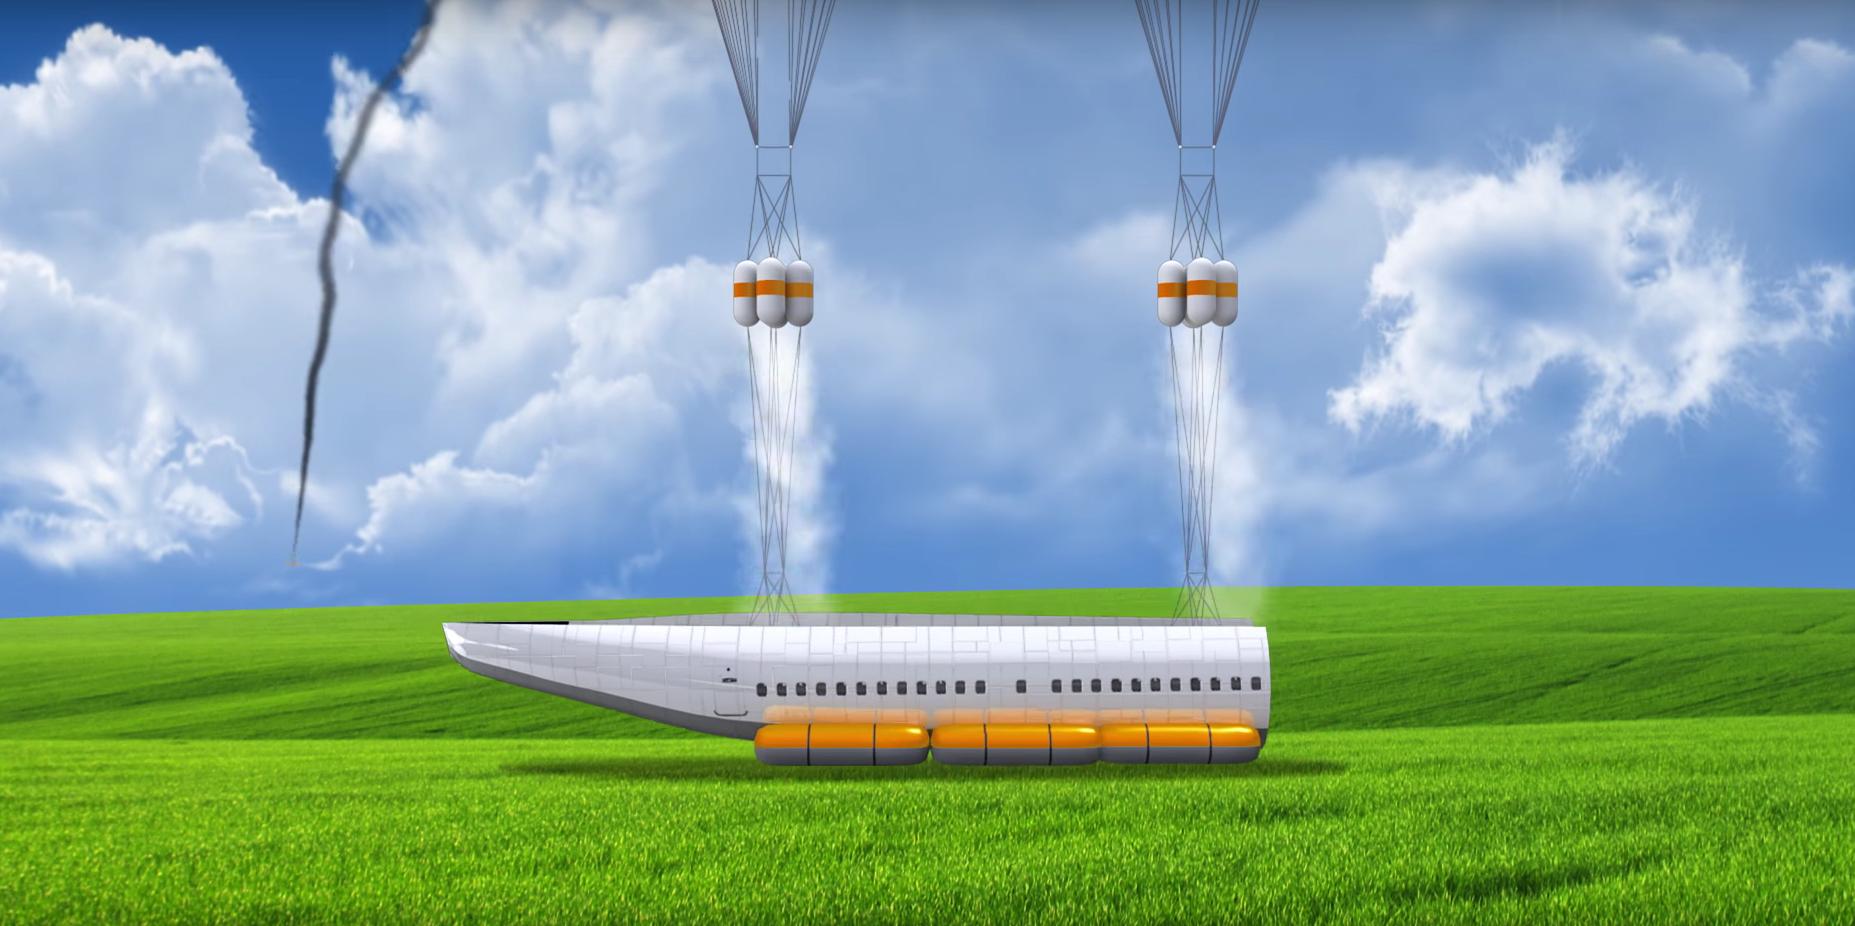 cabina avion desmontable segura 10